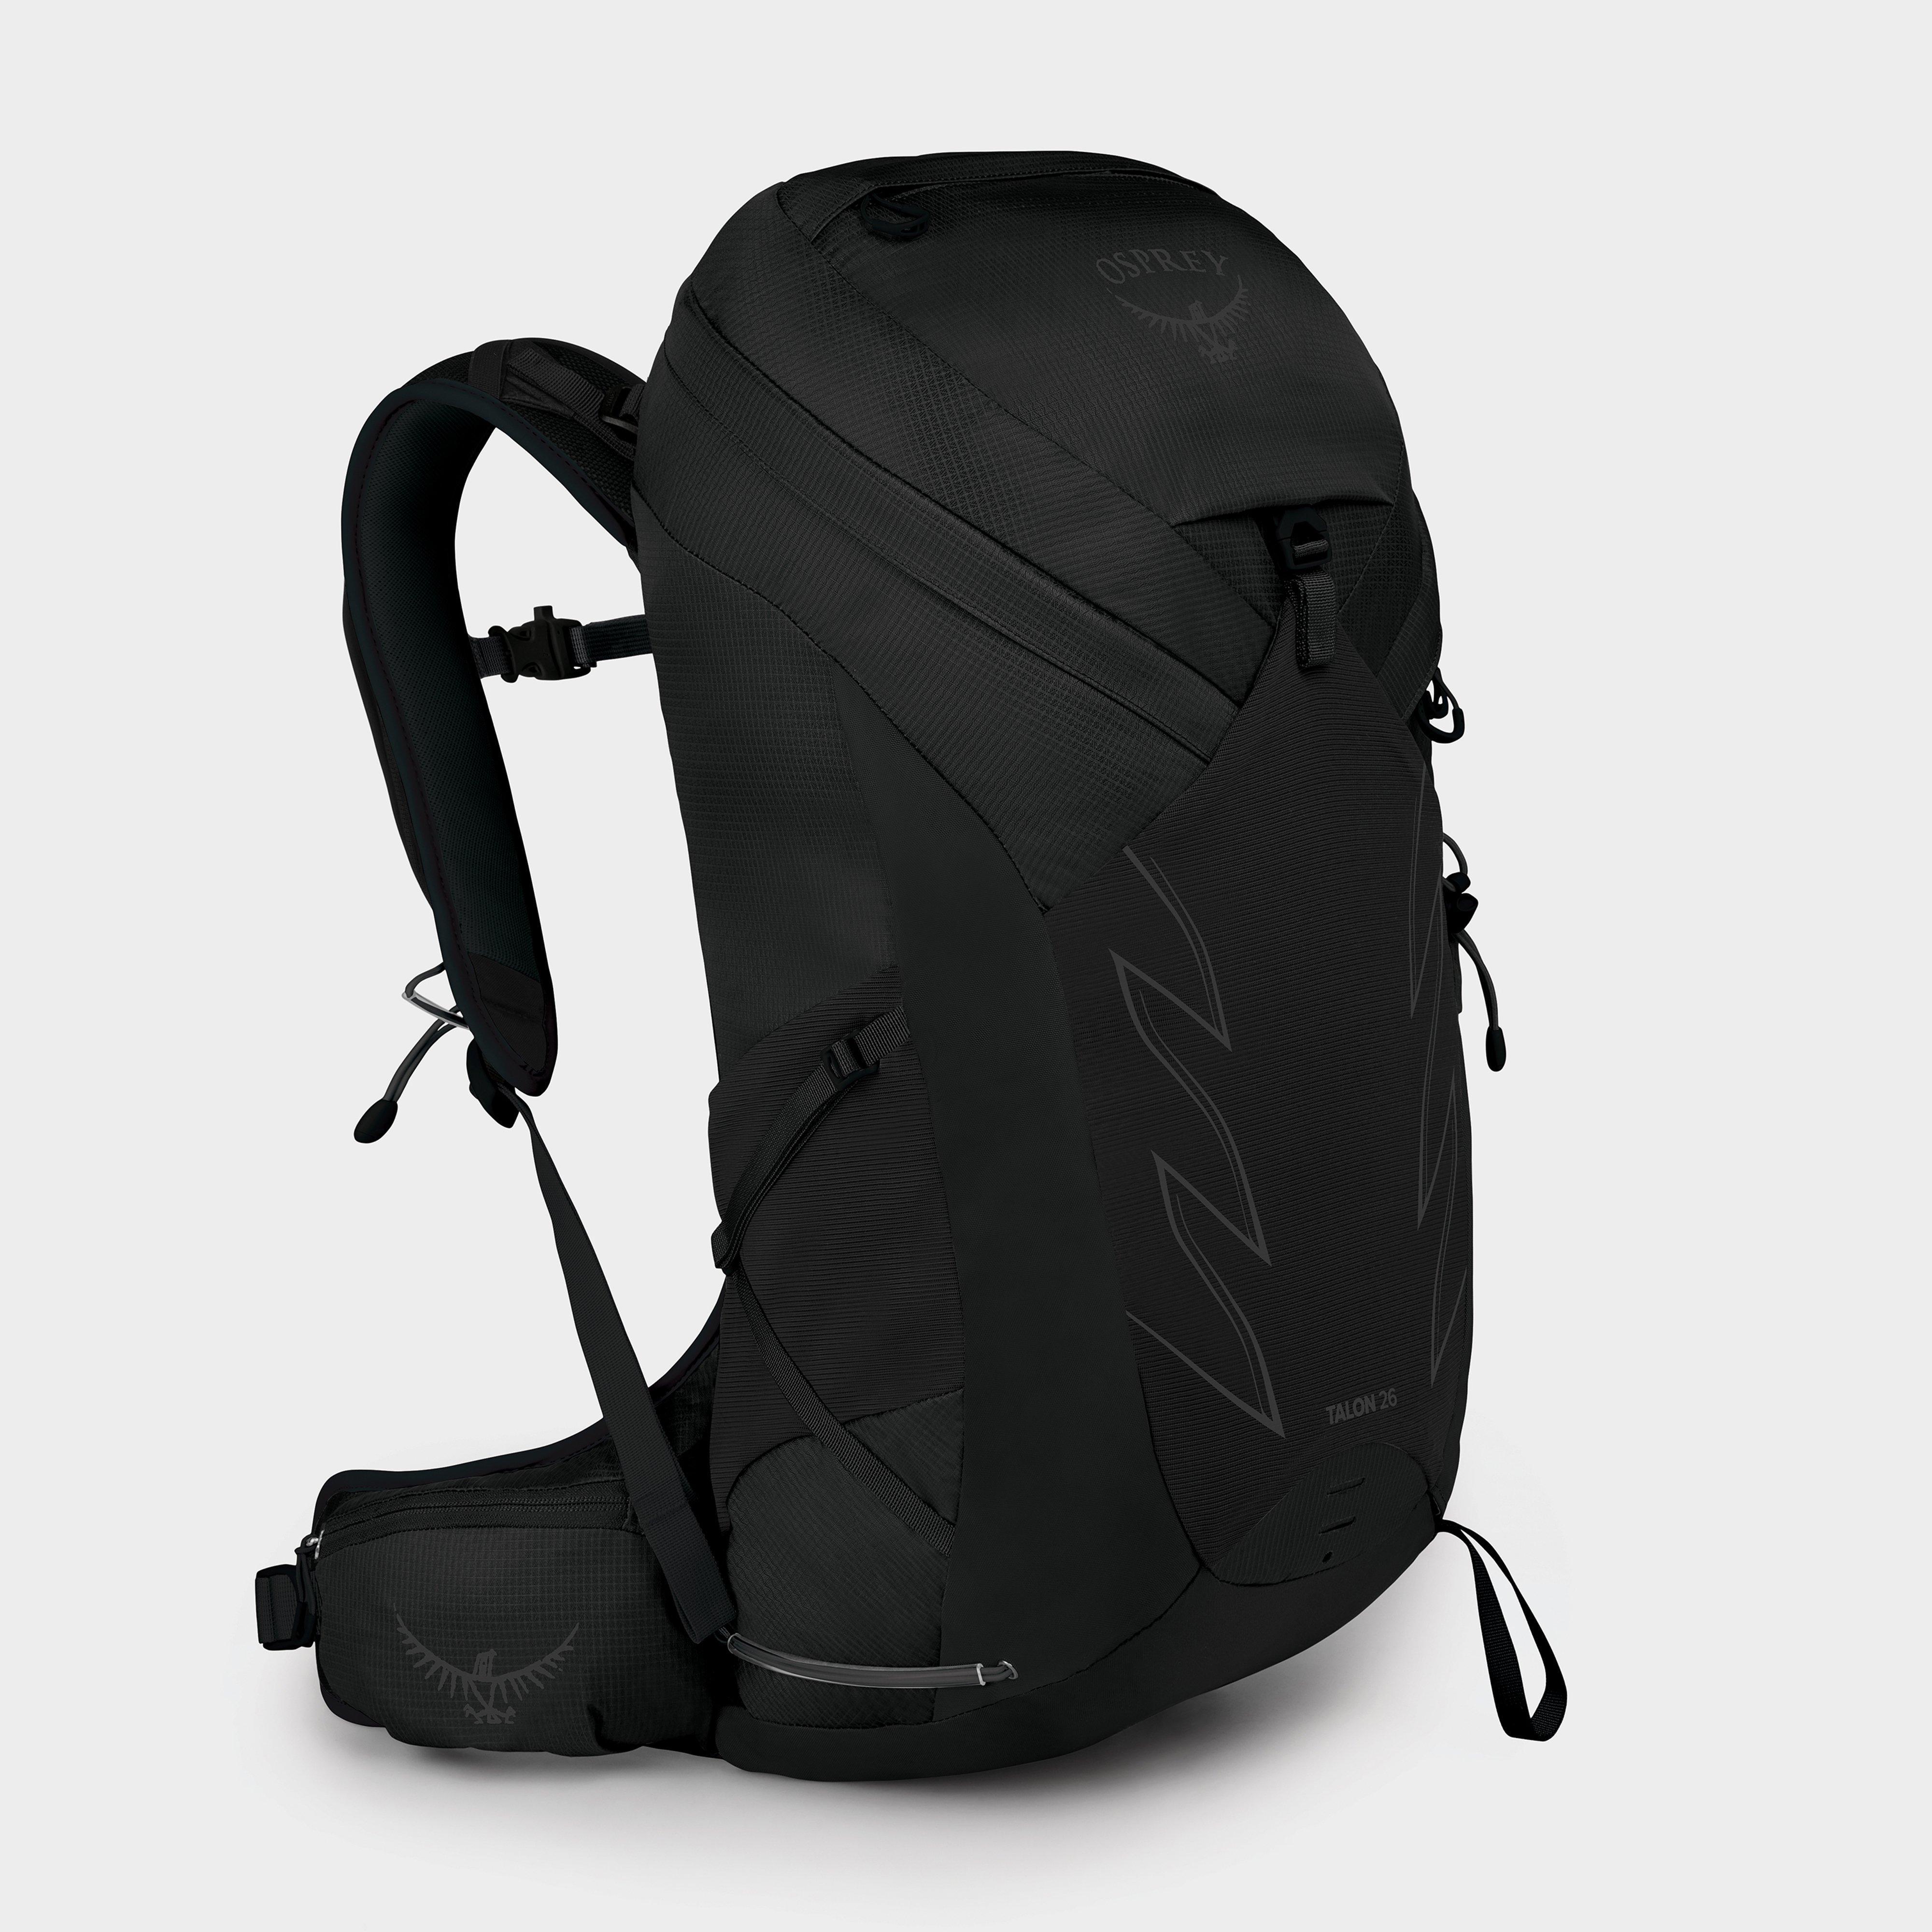 Osprey Talon 26 Daypack - Black/Black, Black